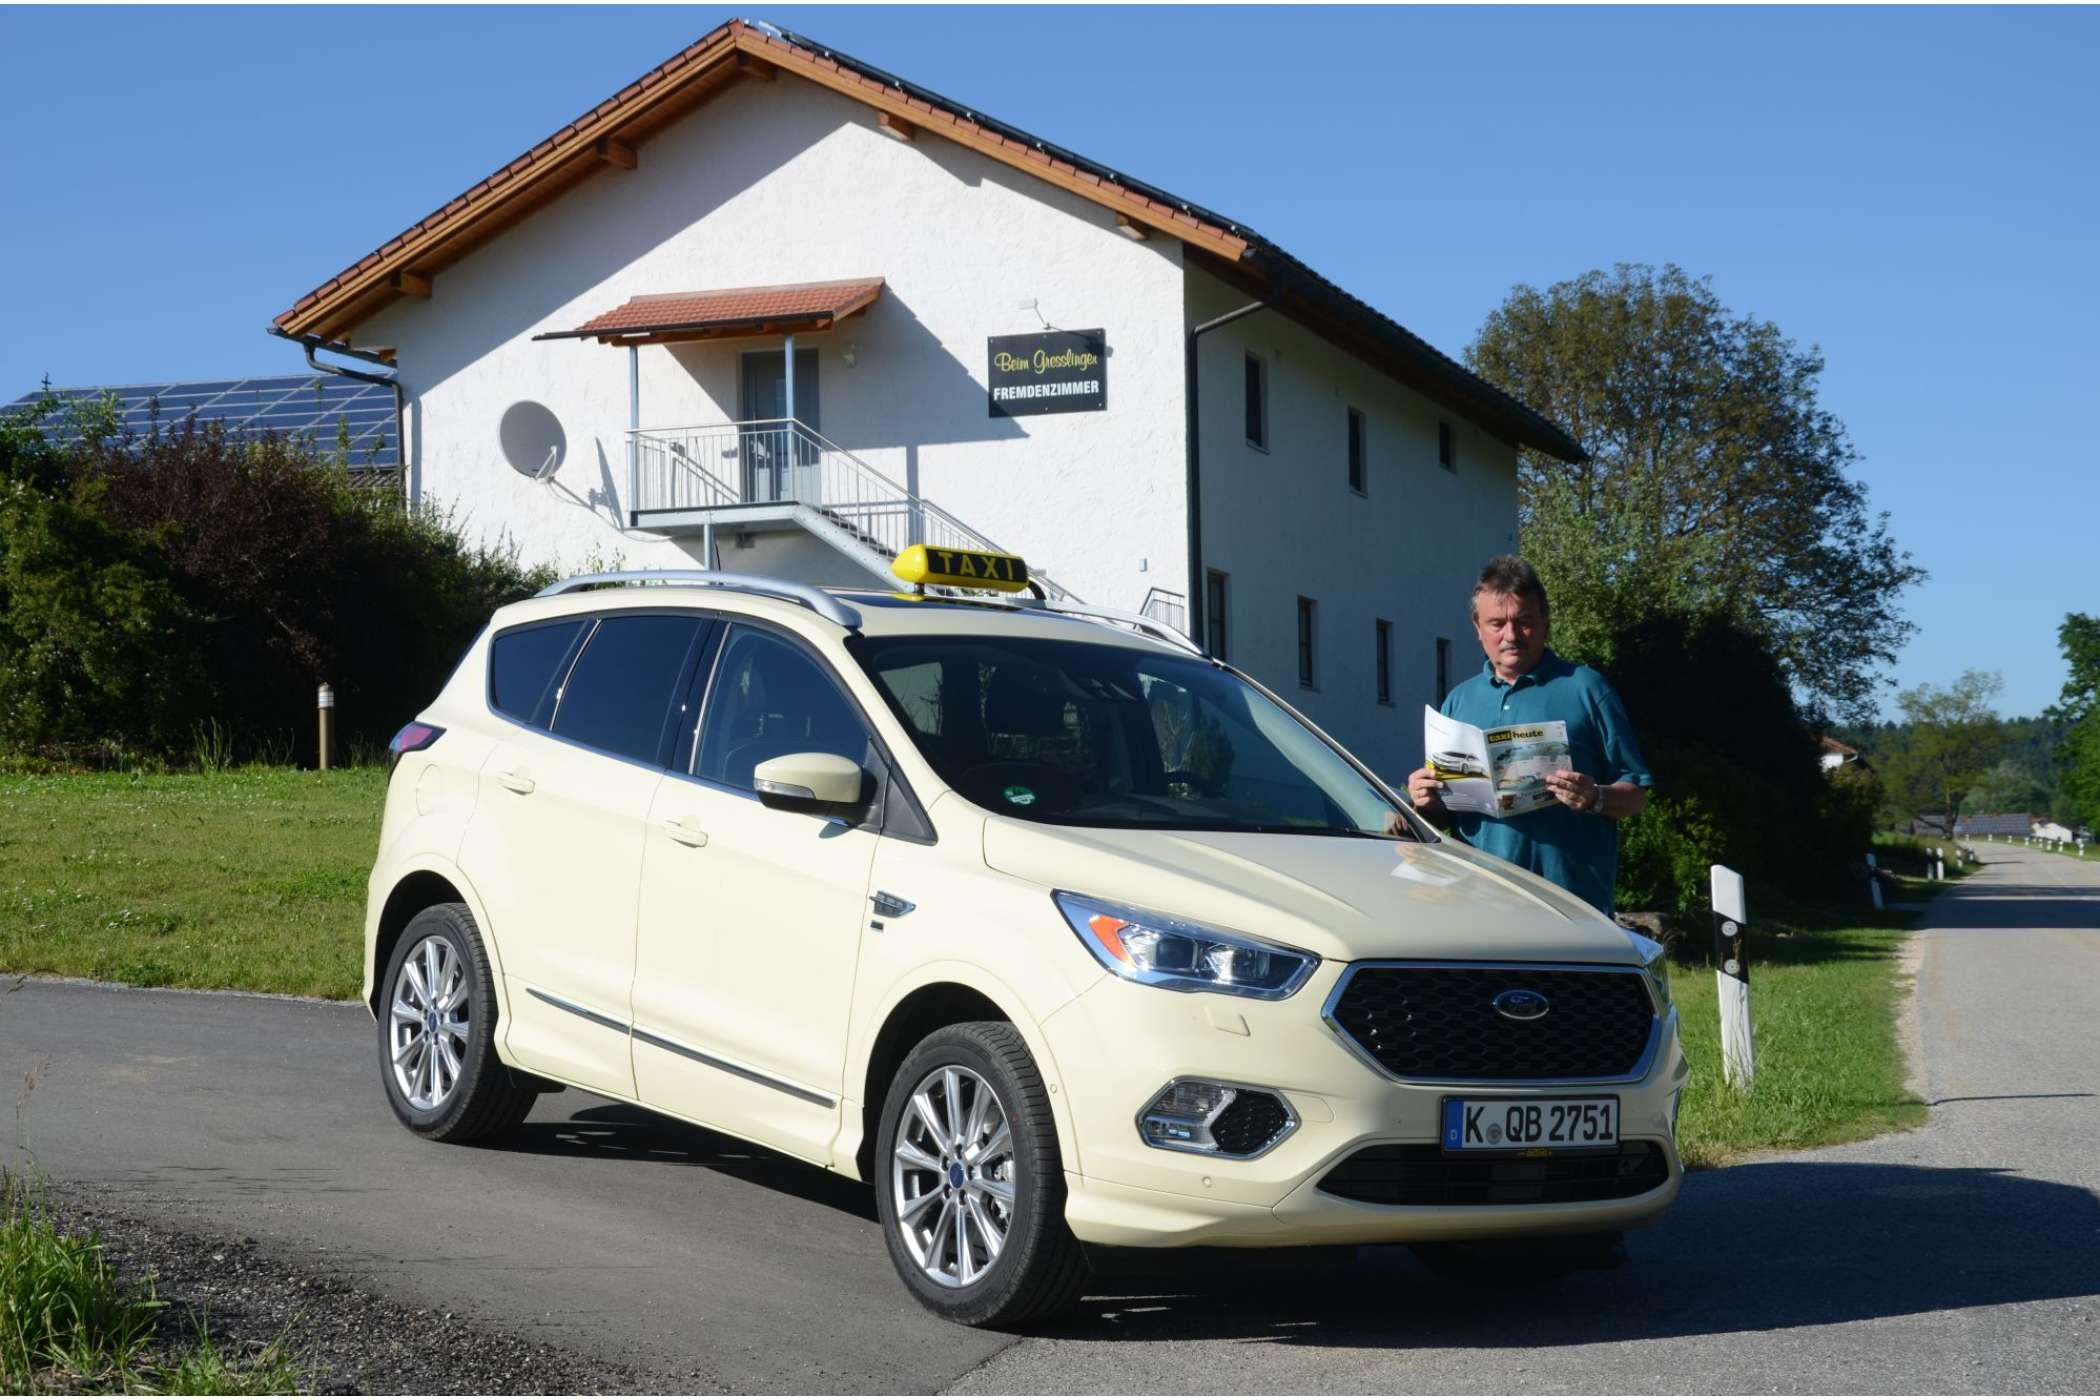 Bildergalerie Ford Kuga-Taxi   Pkw-Tests Fotostrecke ...